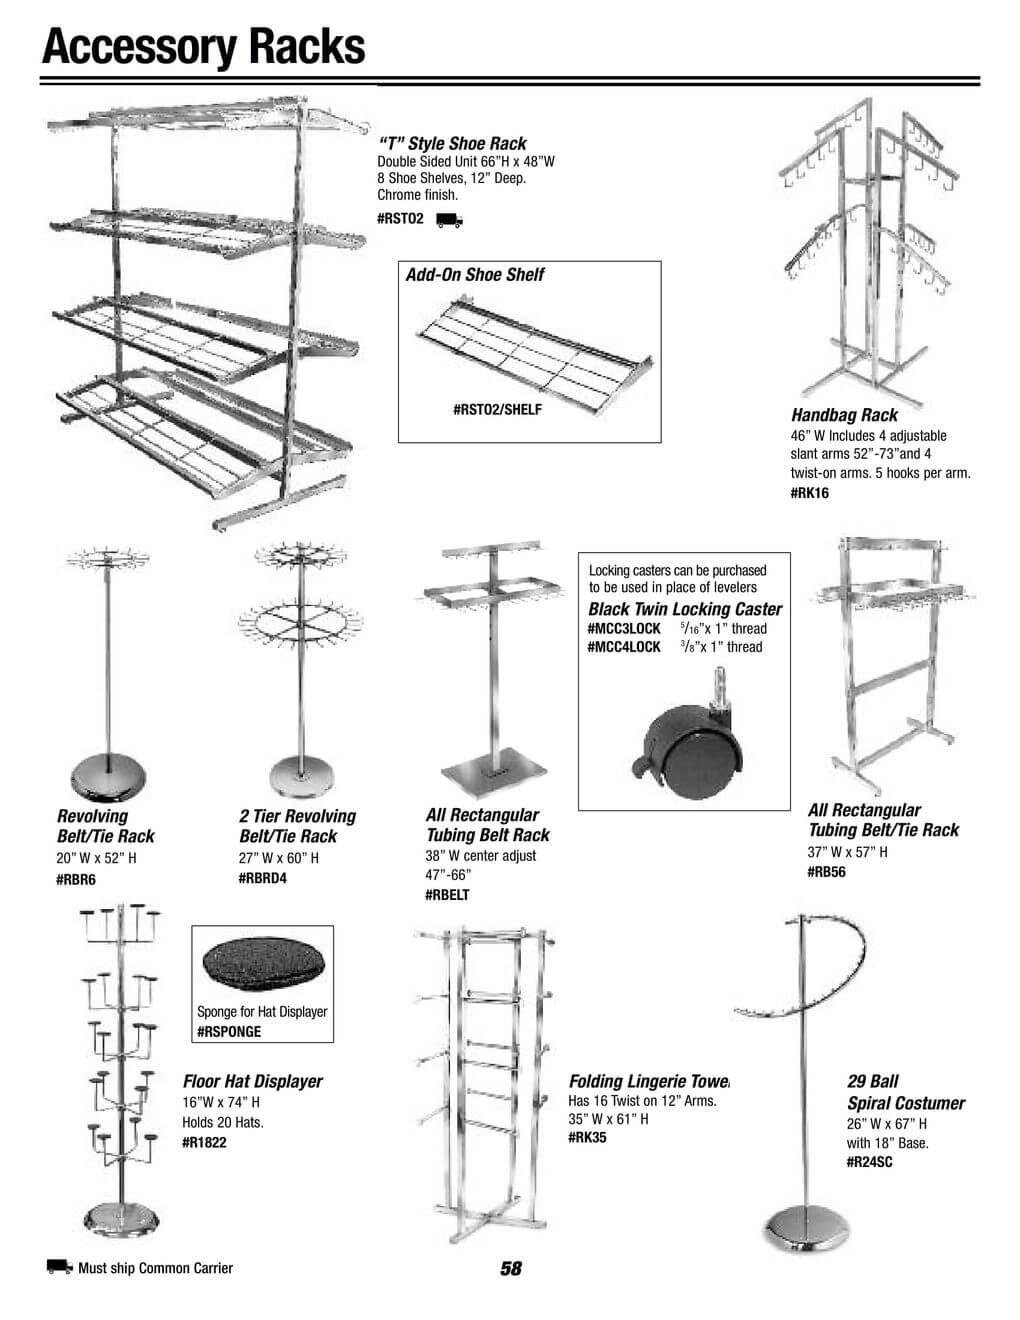 accessory racks